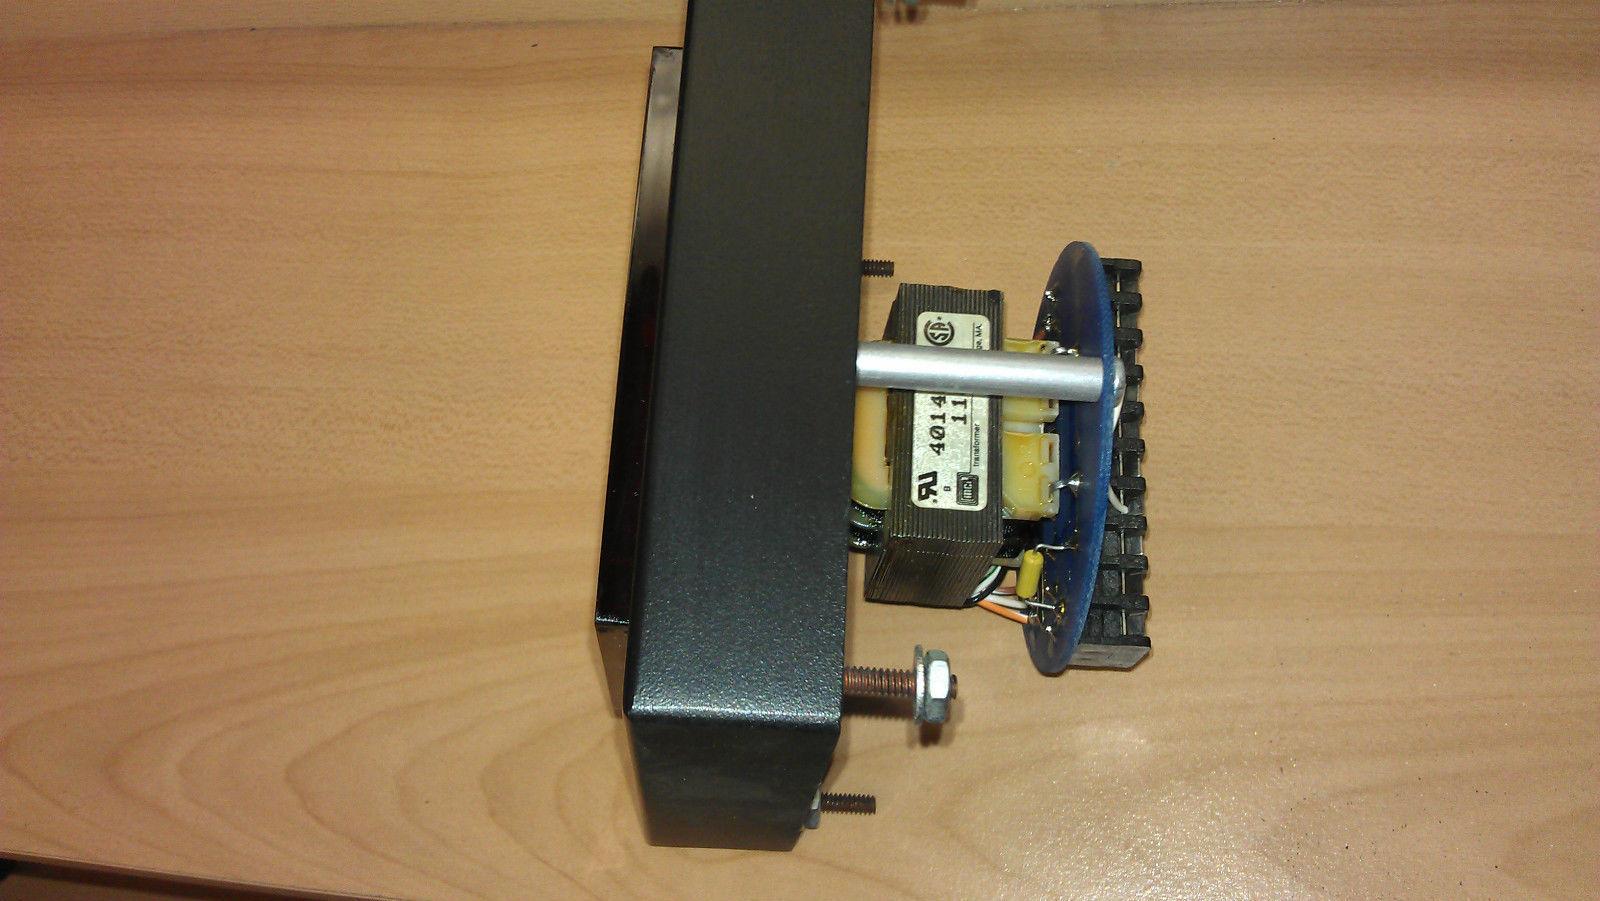 New Digital Electric Meter : New reliance electric digital meter c digit dpm